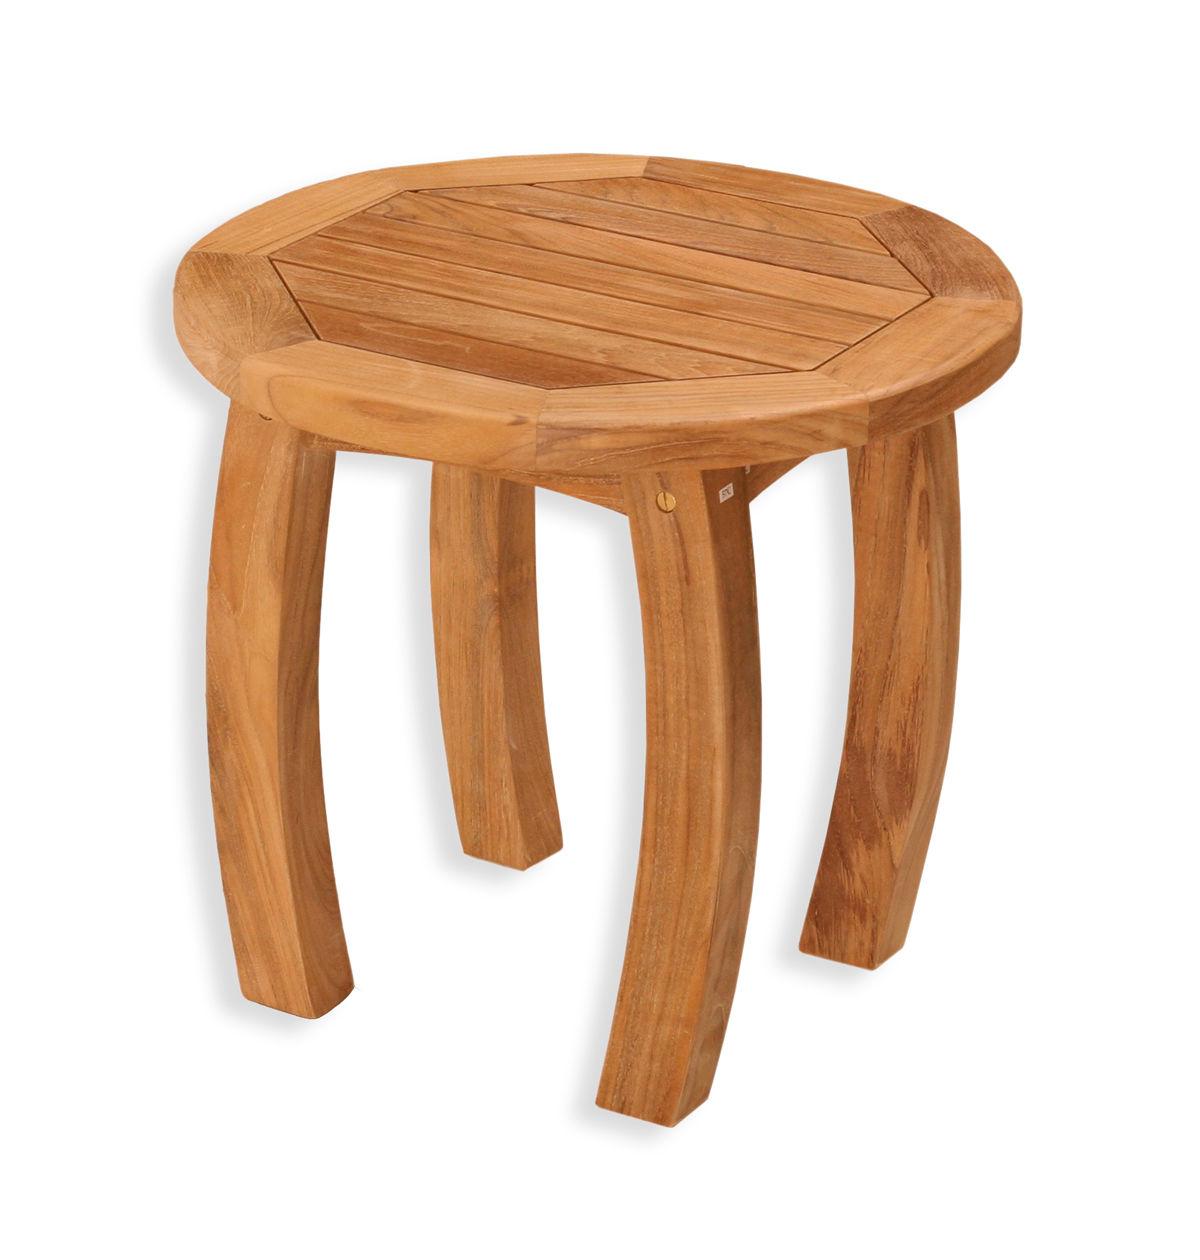 "#174 - 20"" Jakarta Teak Round Side Table in Teak Hardwood - Outdoor Furniture"